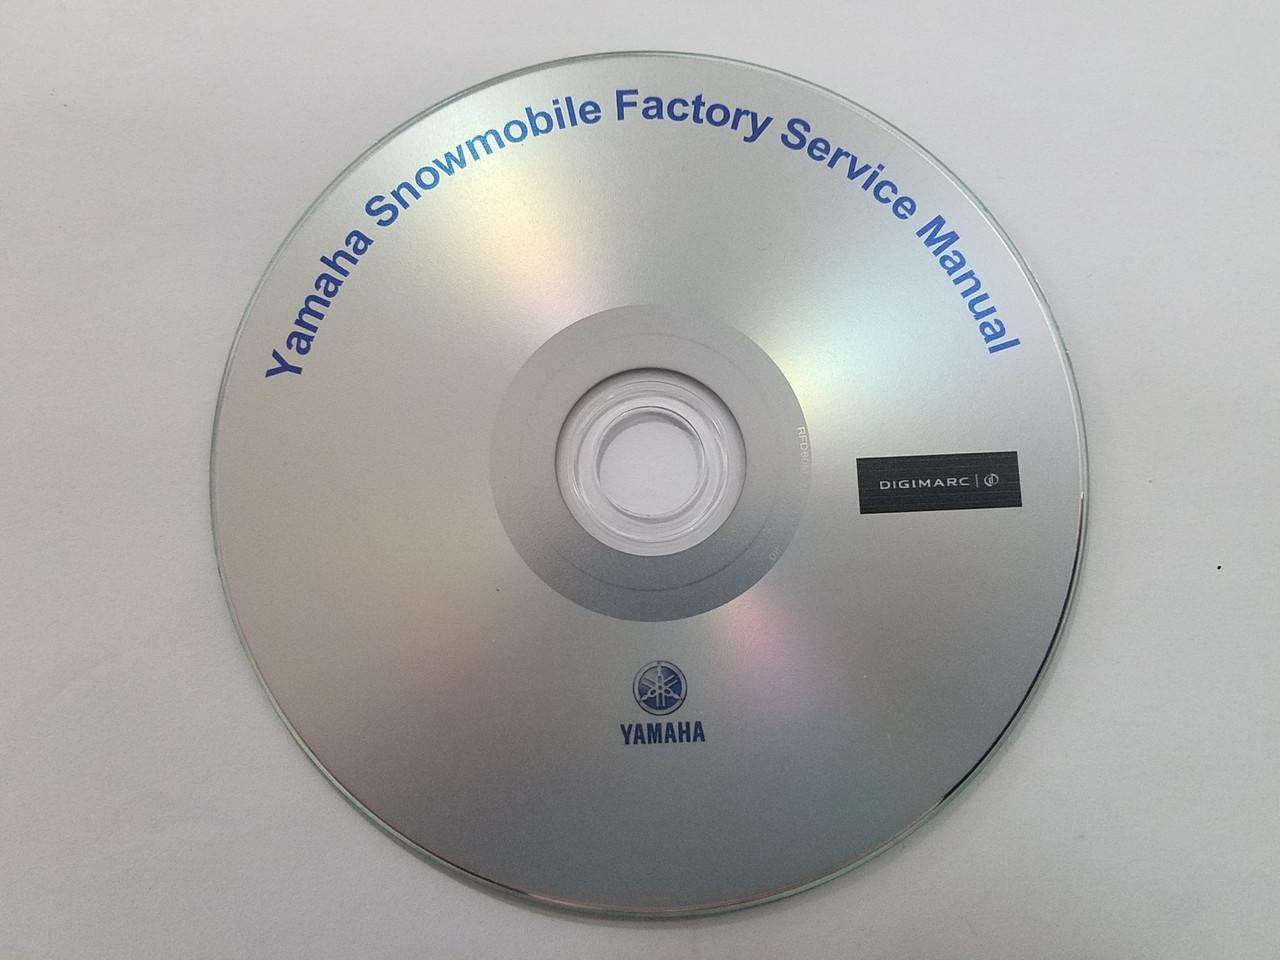 2010 Yamaha Snowmobile Service Manuals